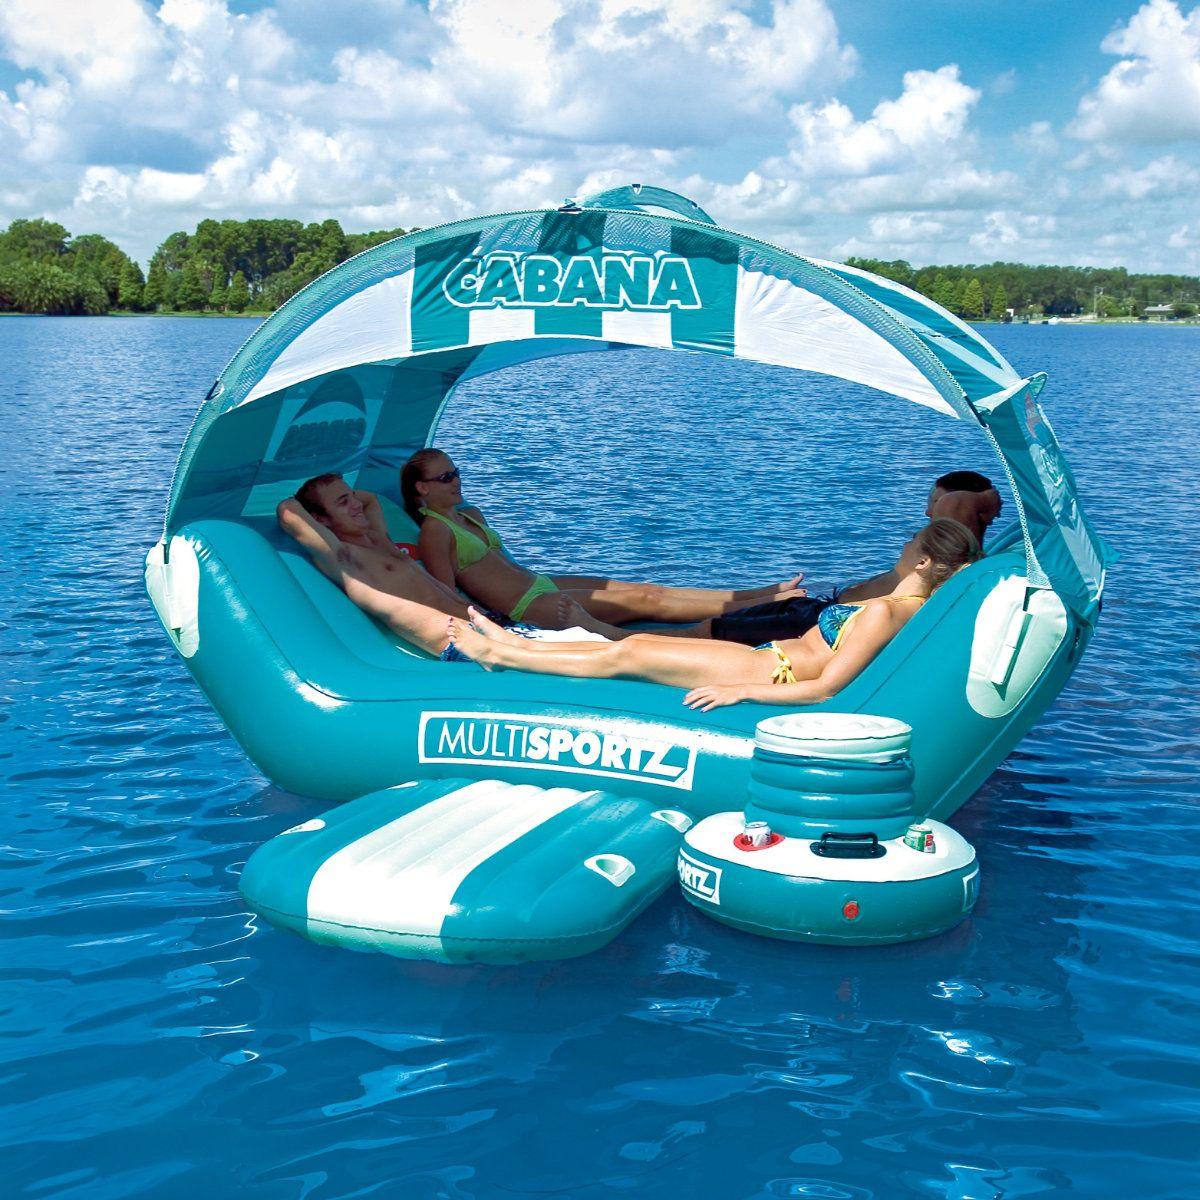 Overton S Sportsstuff Cabana Islander Watersports Lake Pool Leisure Party Island Floats Toys Rafts Water Floating Decks